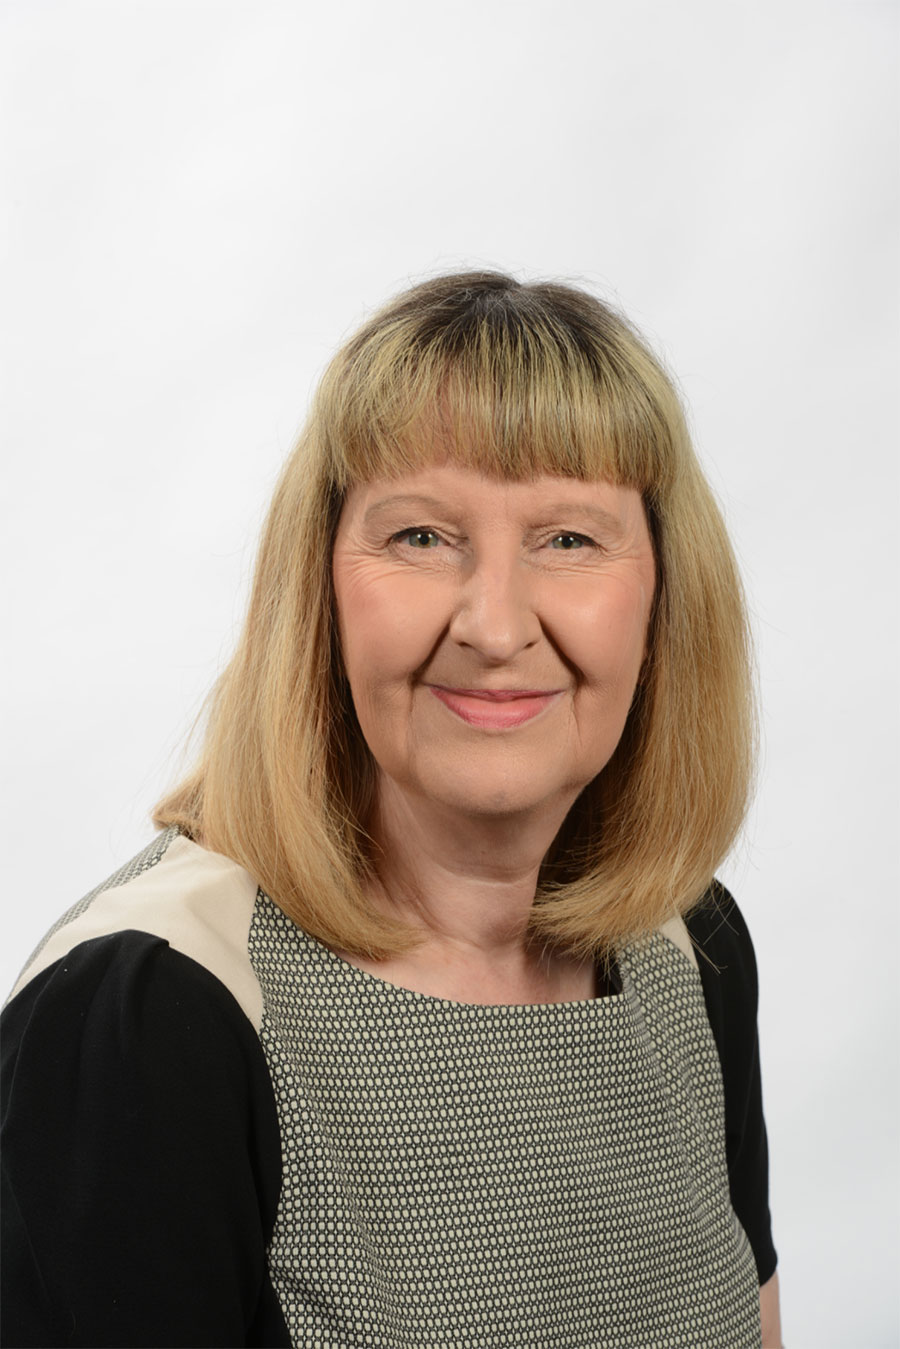 Tracey Slesser